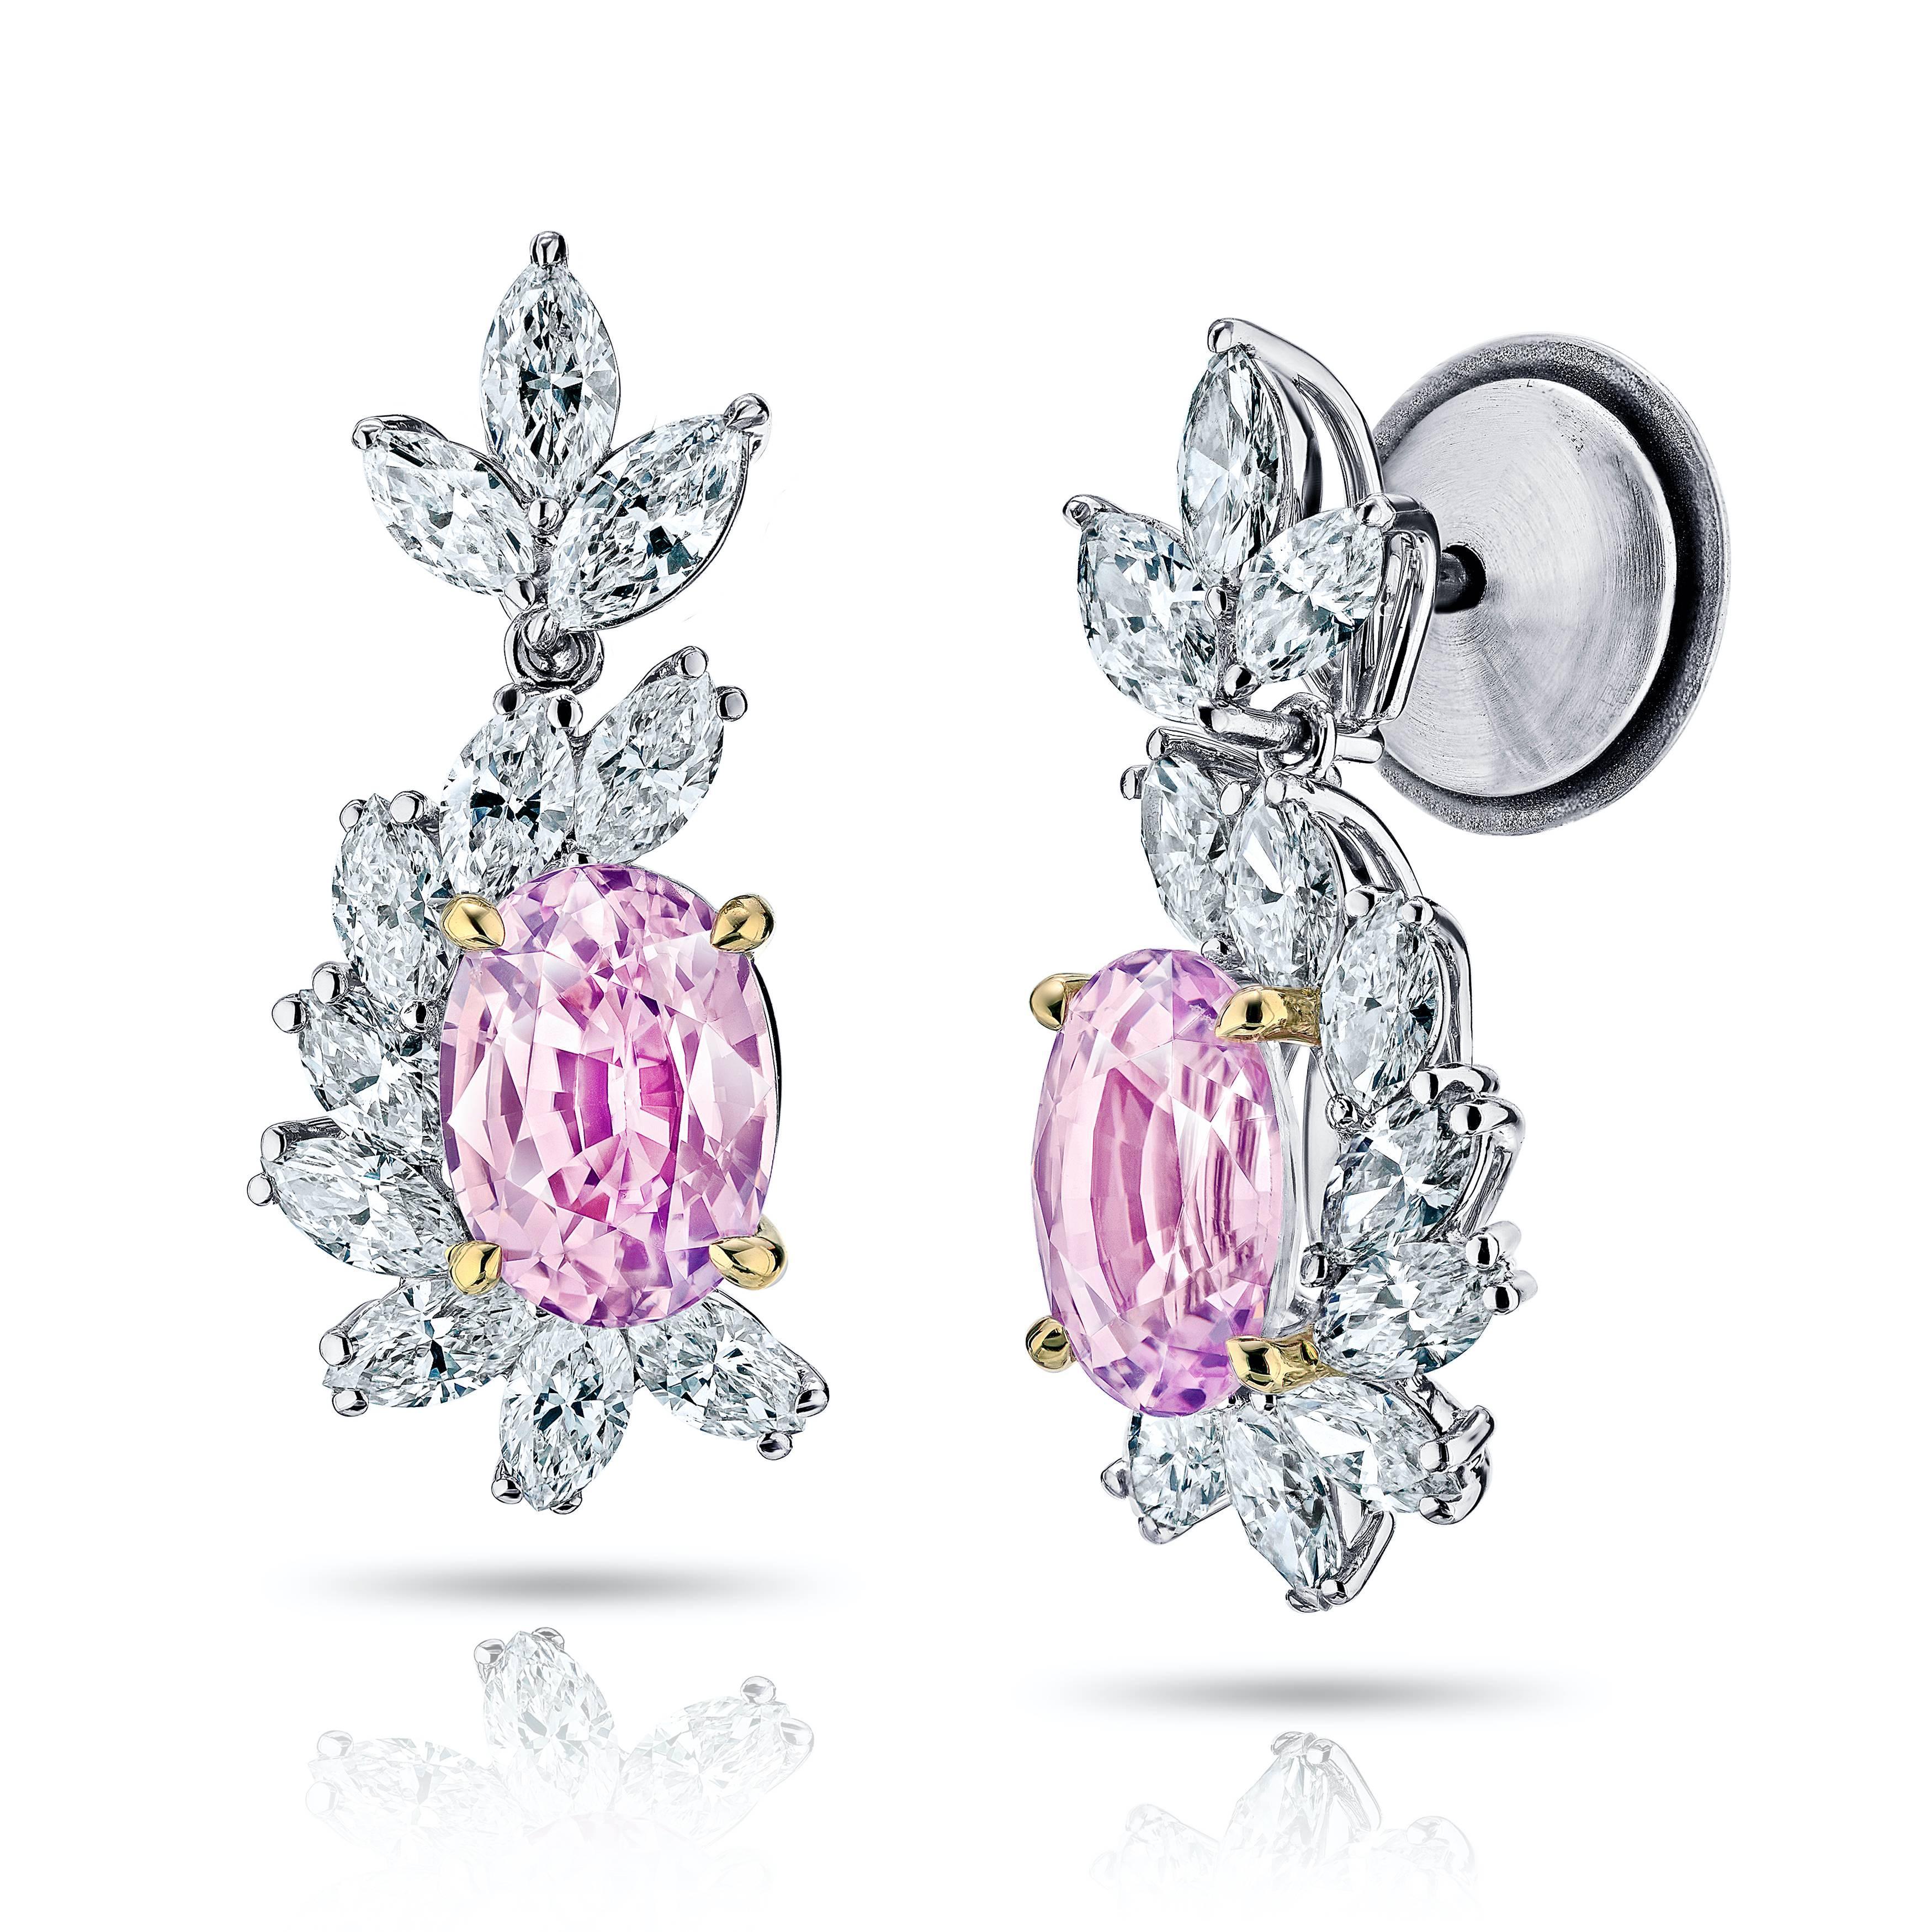 3 69 Carat Oval Natural Padparadscha Sapphire and Diamond Platinum